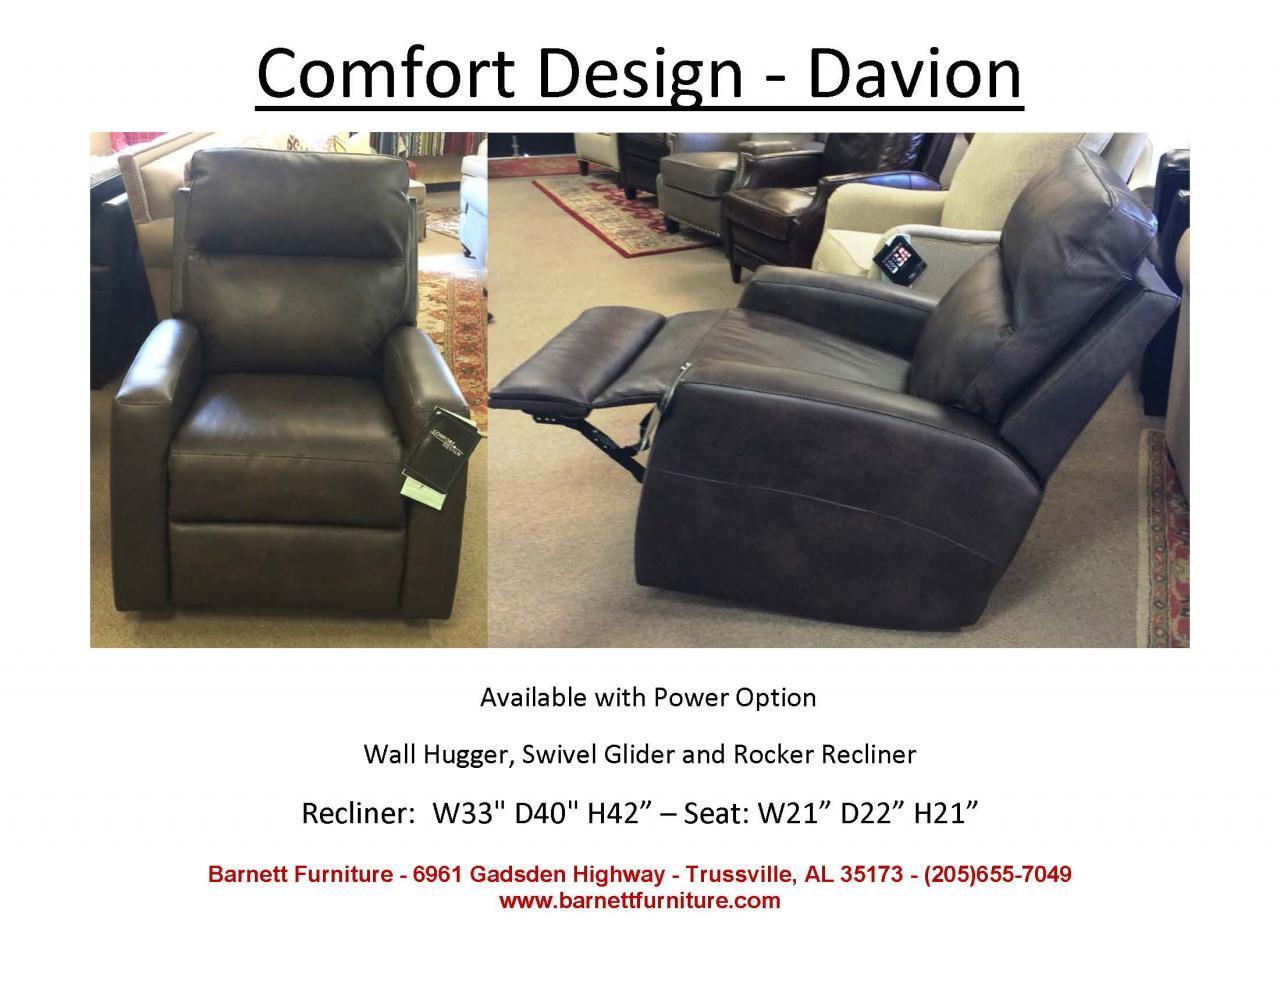 ... Comfort Design Davion Recliner - Wall Hugger Swivel Glider or Rocker Recliner ...  sc 1 st  Barnett Furniture & Barnett Furniture - Swivel / Swivel Gliders islam-shia.org